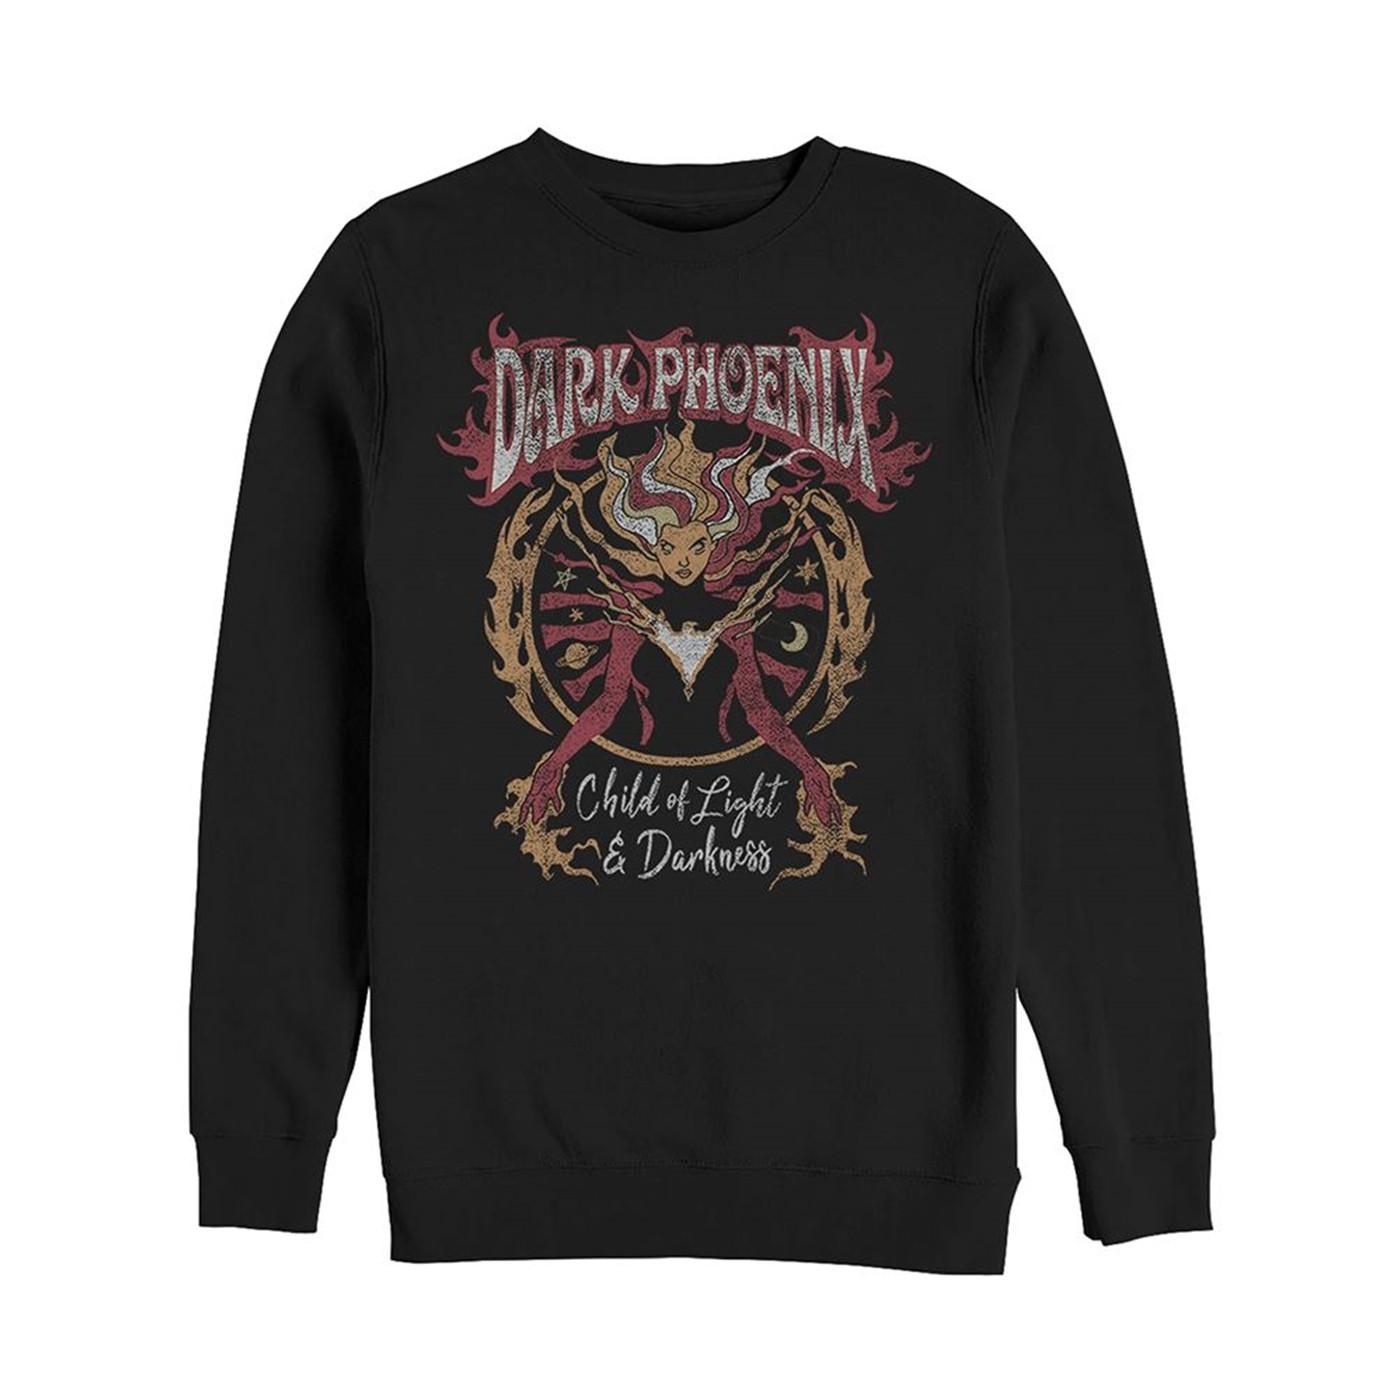 X-Men Dark Phoenix Child of Light and Darkness Sweatshirt